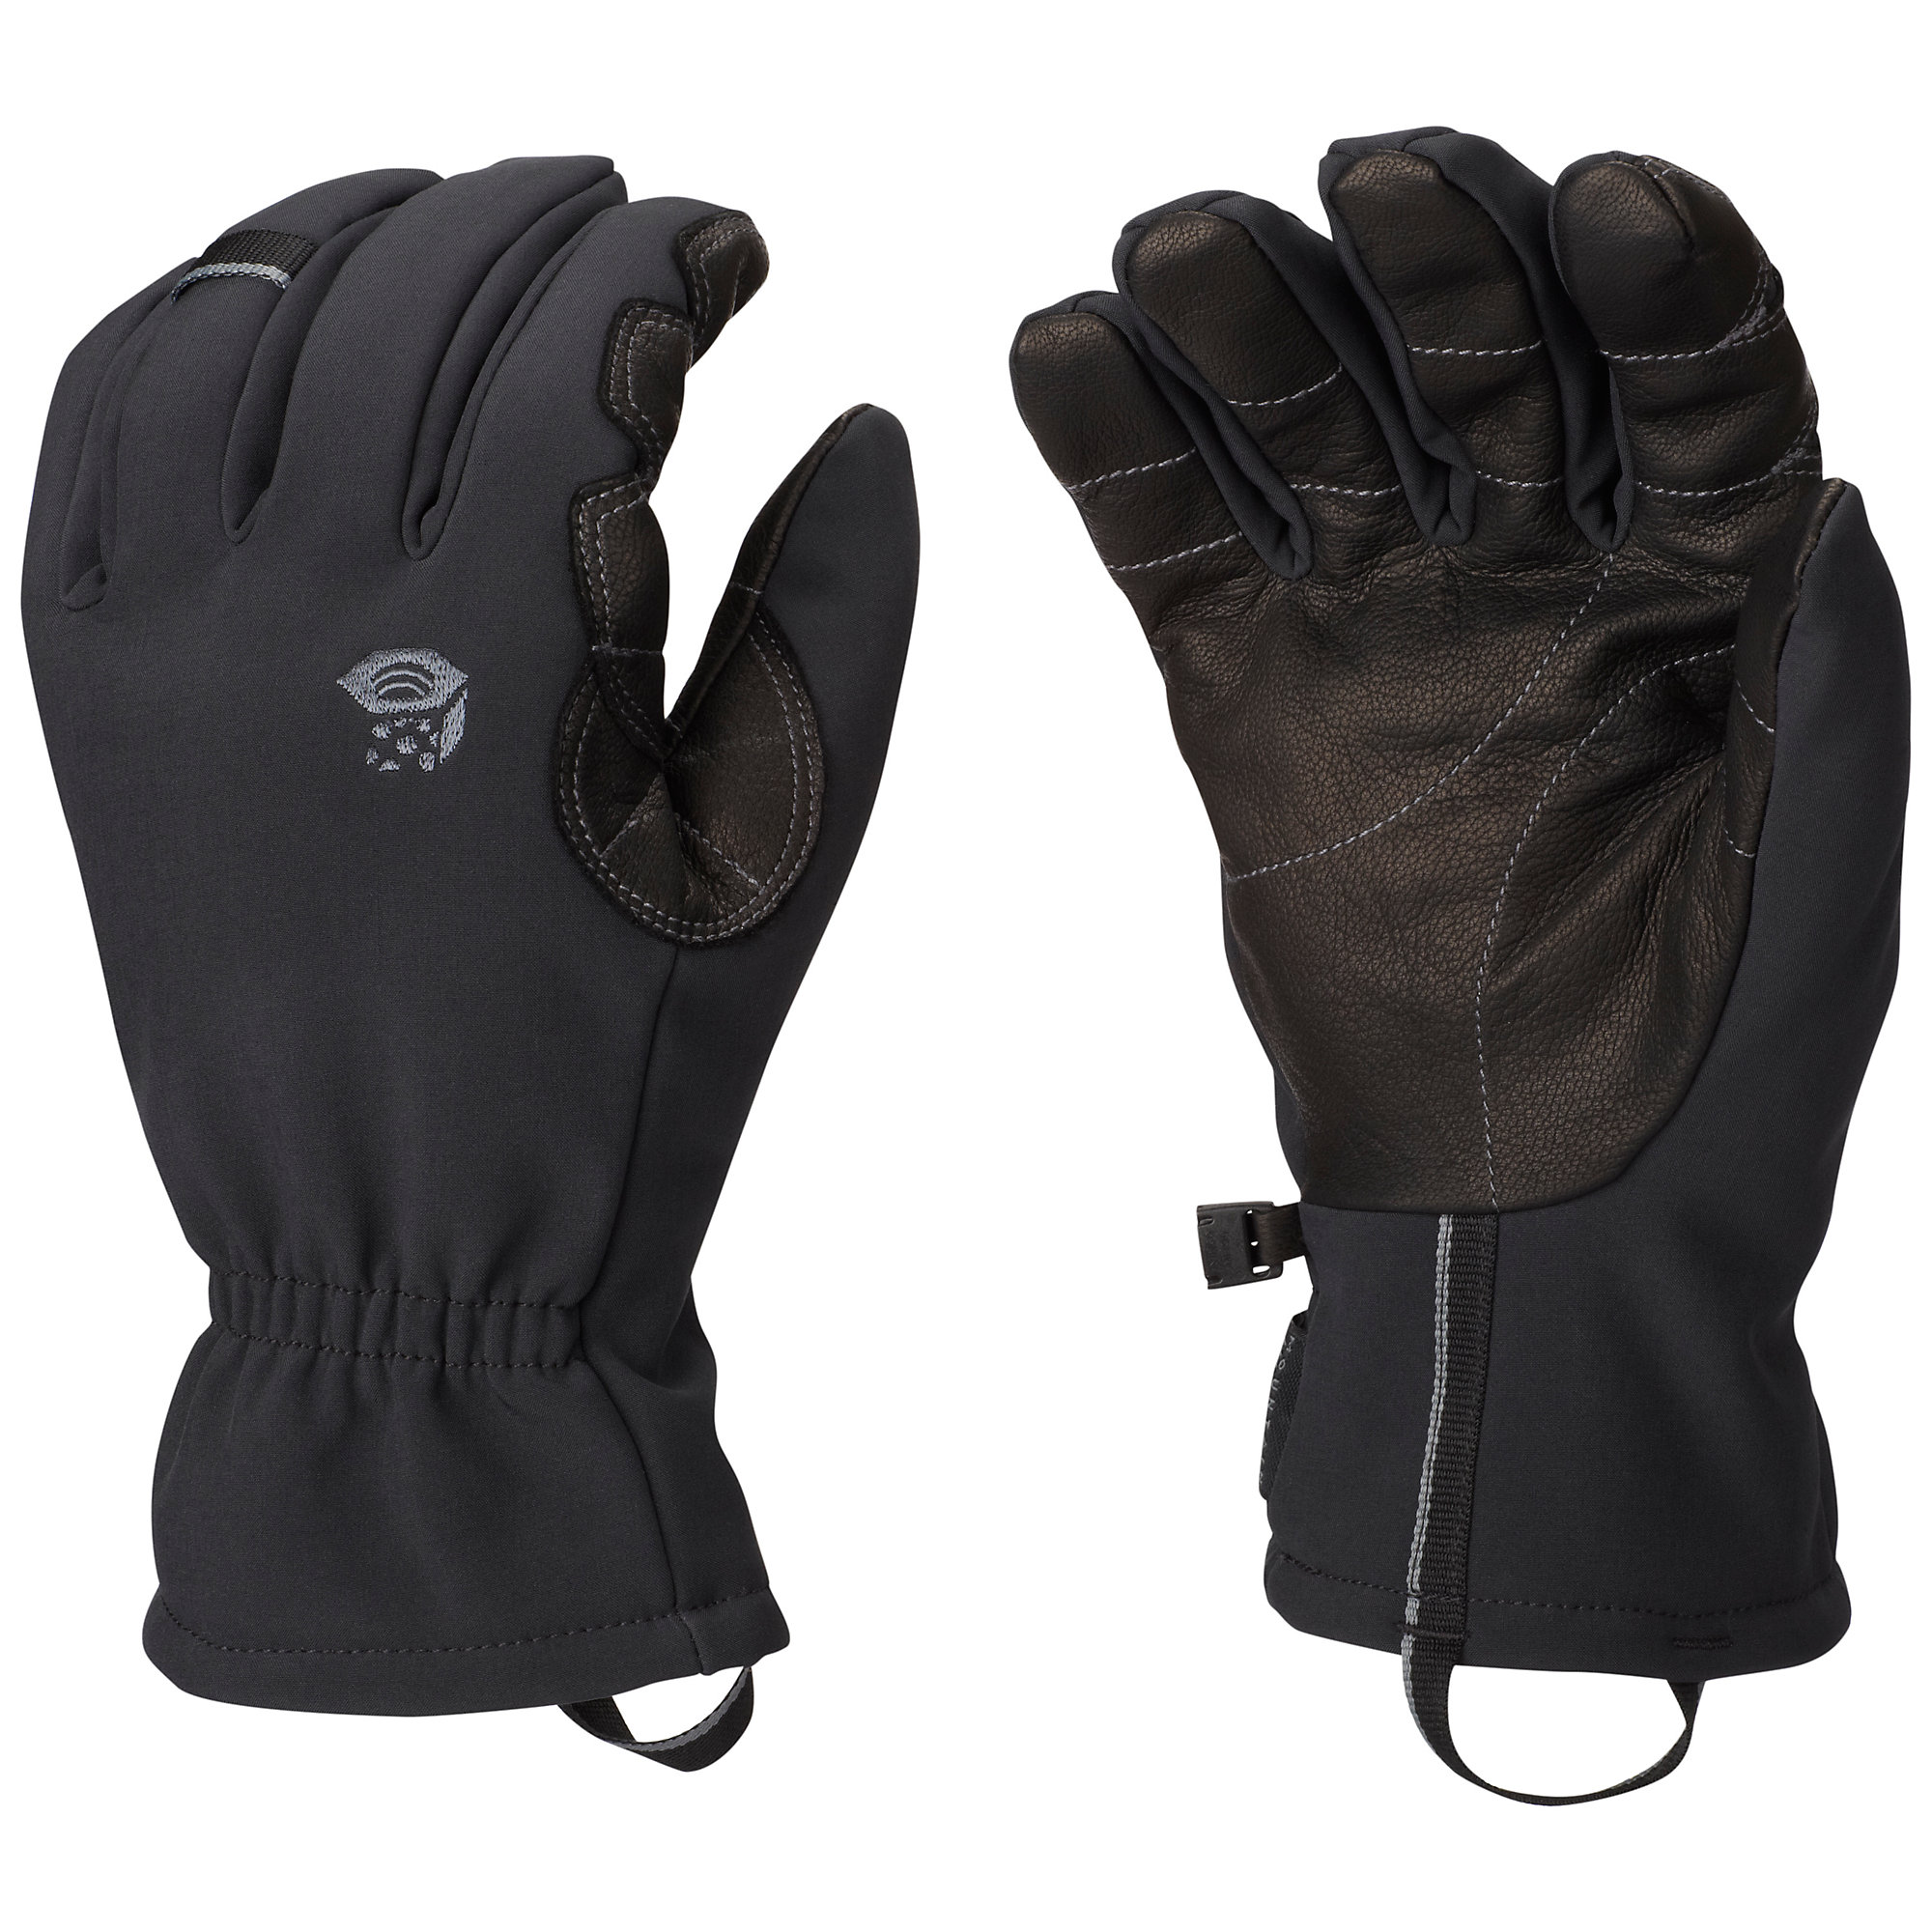 photo: Mountain Hardwear Torsion Insulated Glove insulated glove/mitten